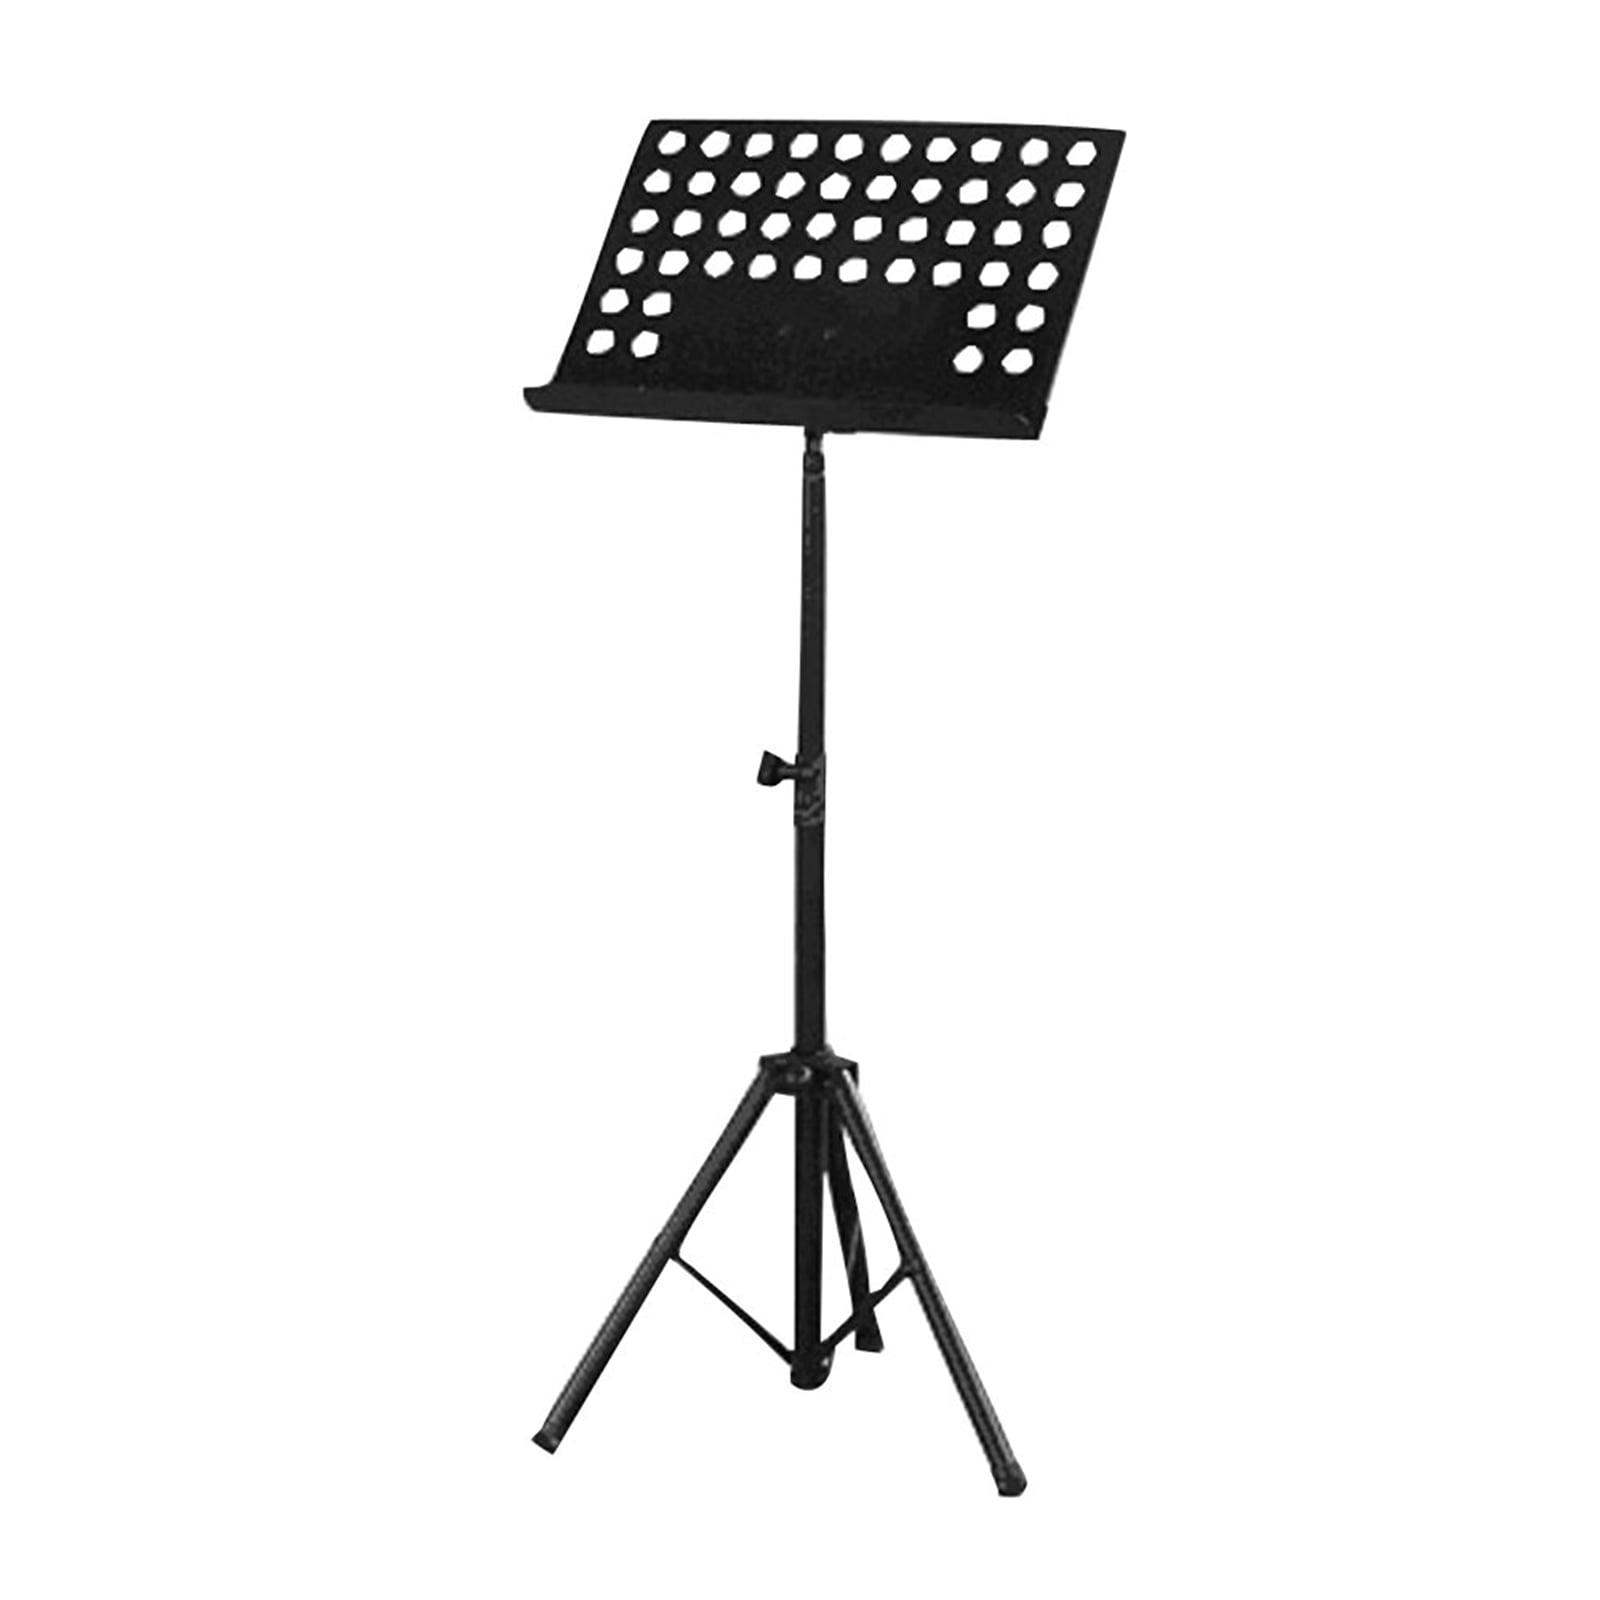 PylePro PMS1 Heavy Duty Tripod Music Note Stand by Pyle